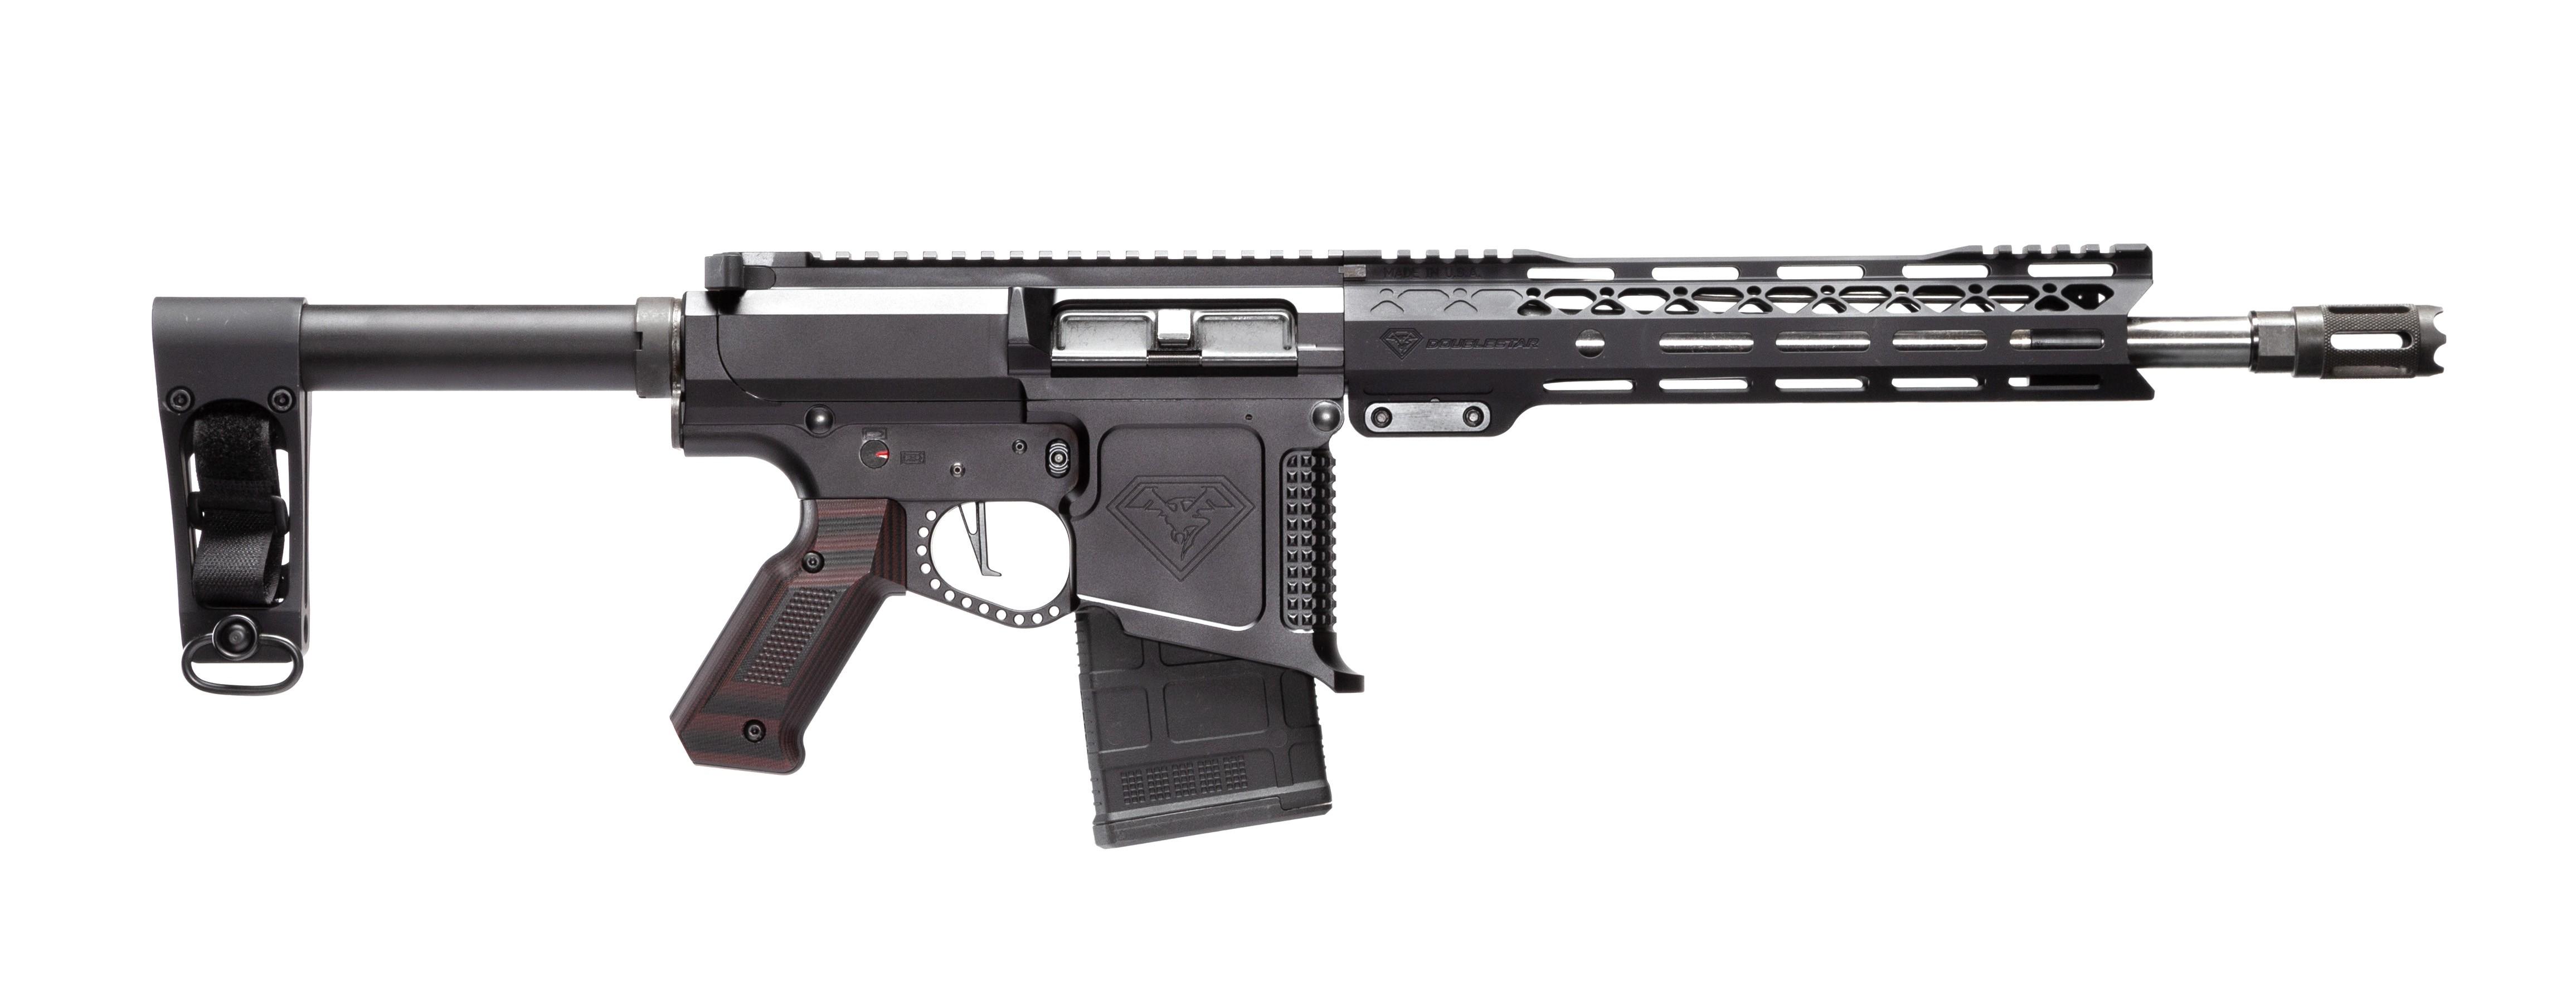 DoubleStar Unveils its STAR10-P .308 Pistol